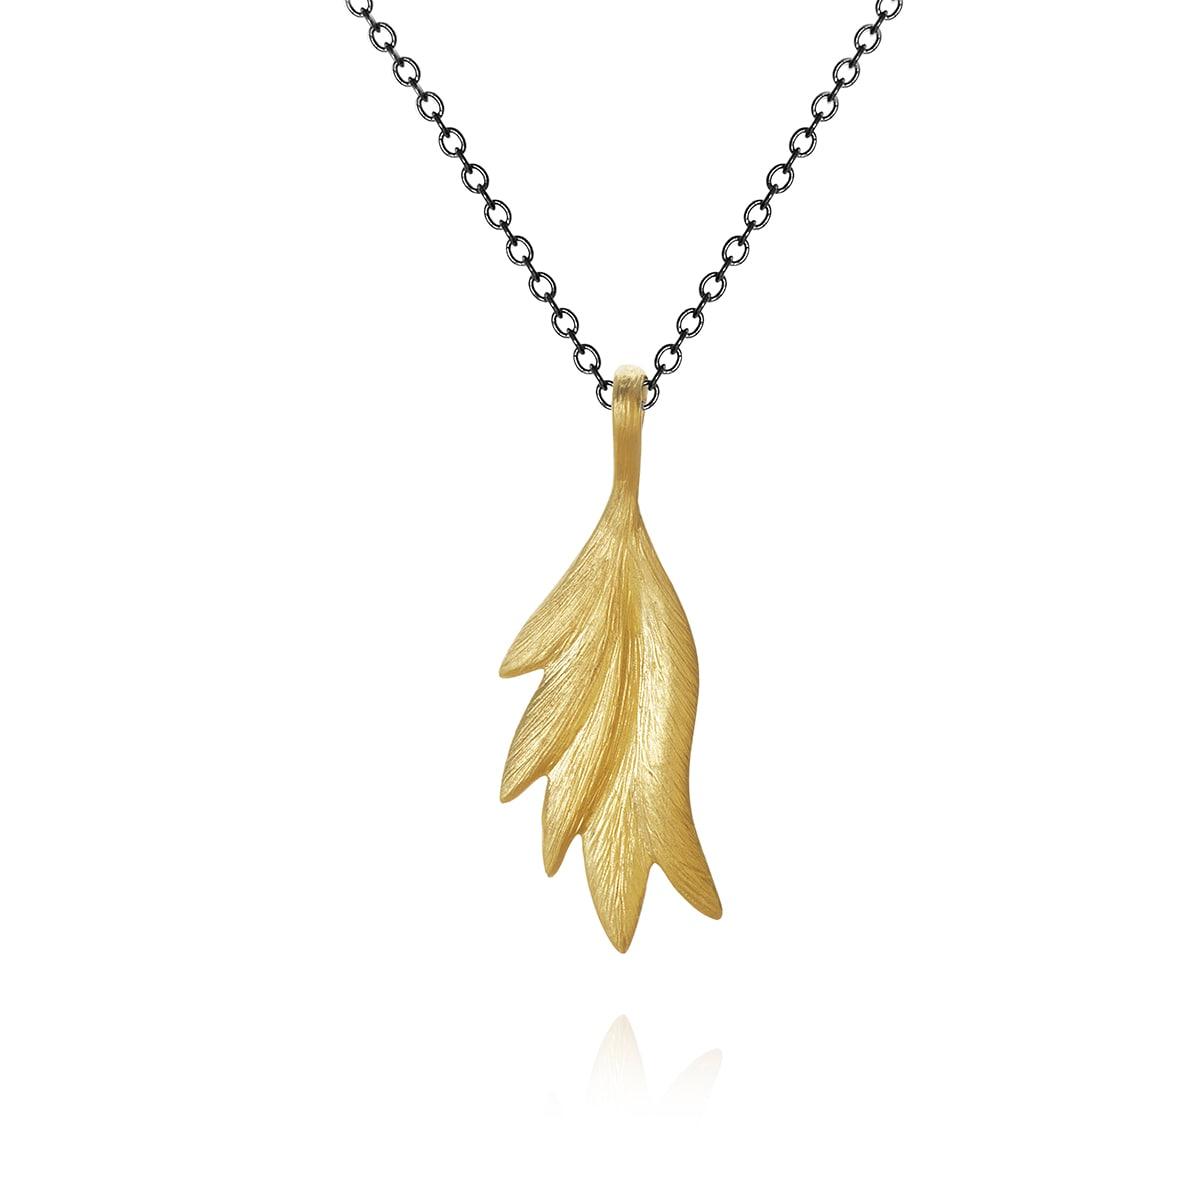 Dulong, Fine Jewelry_Aura_Guldhänge_AUR5-A1030_hos_Jarl_Sandin